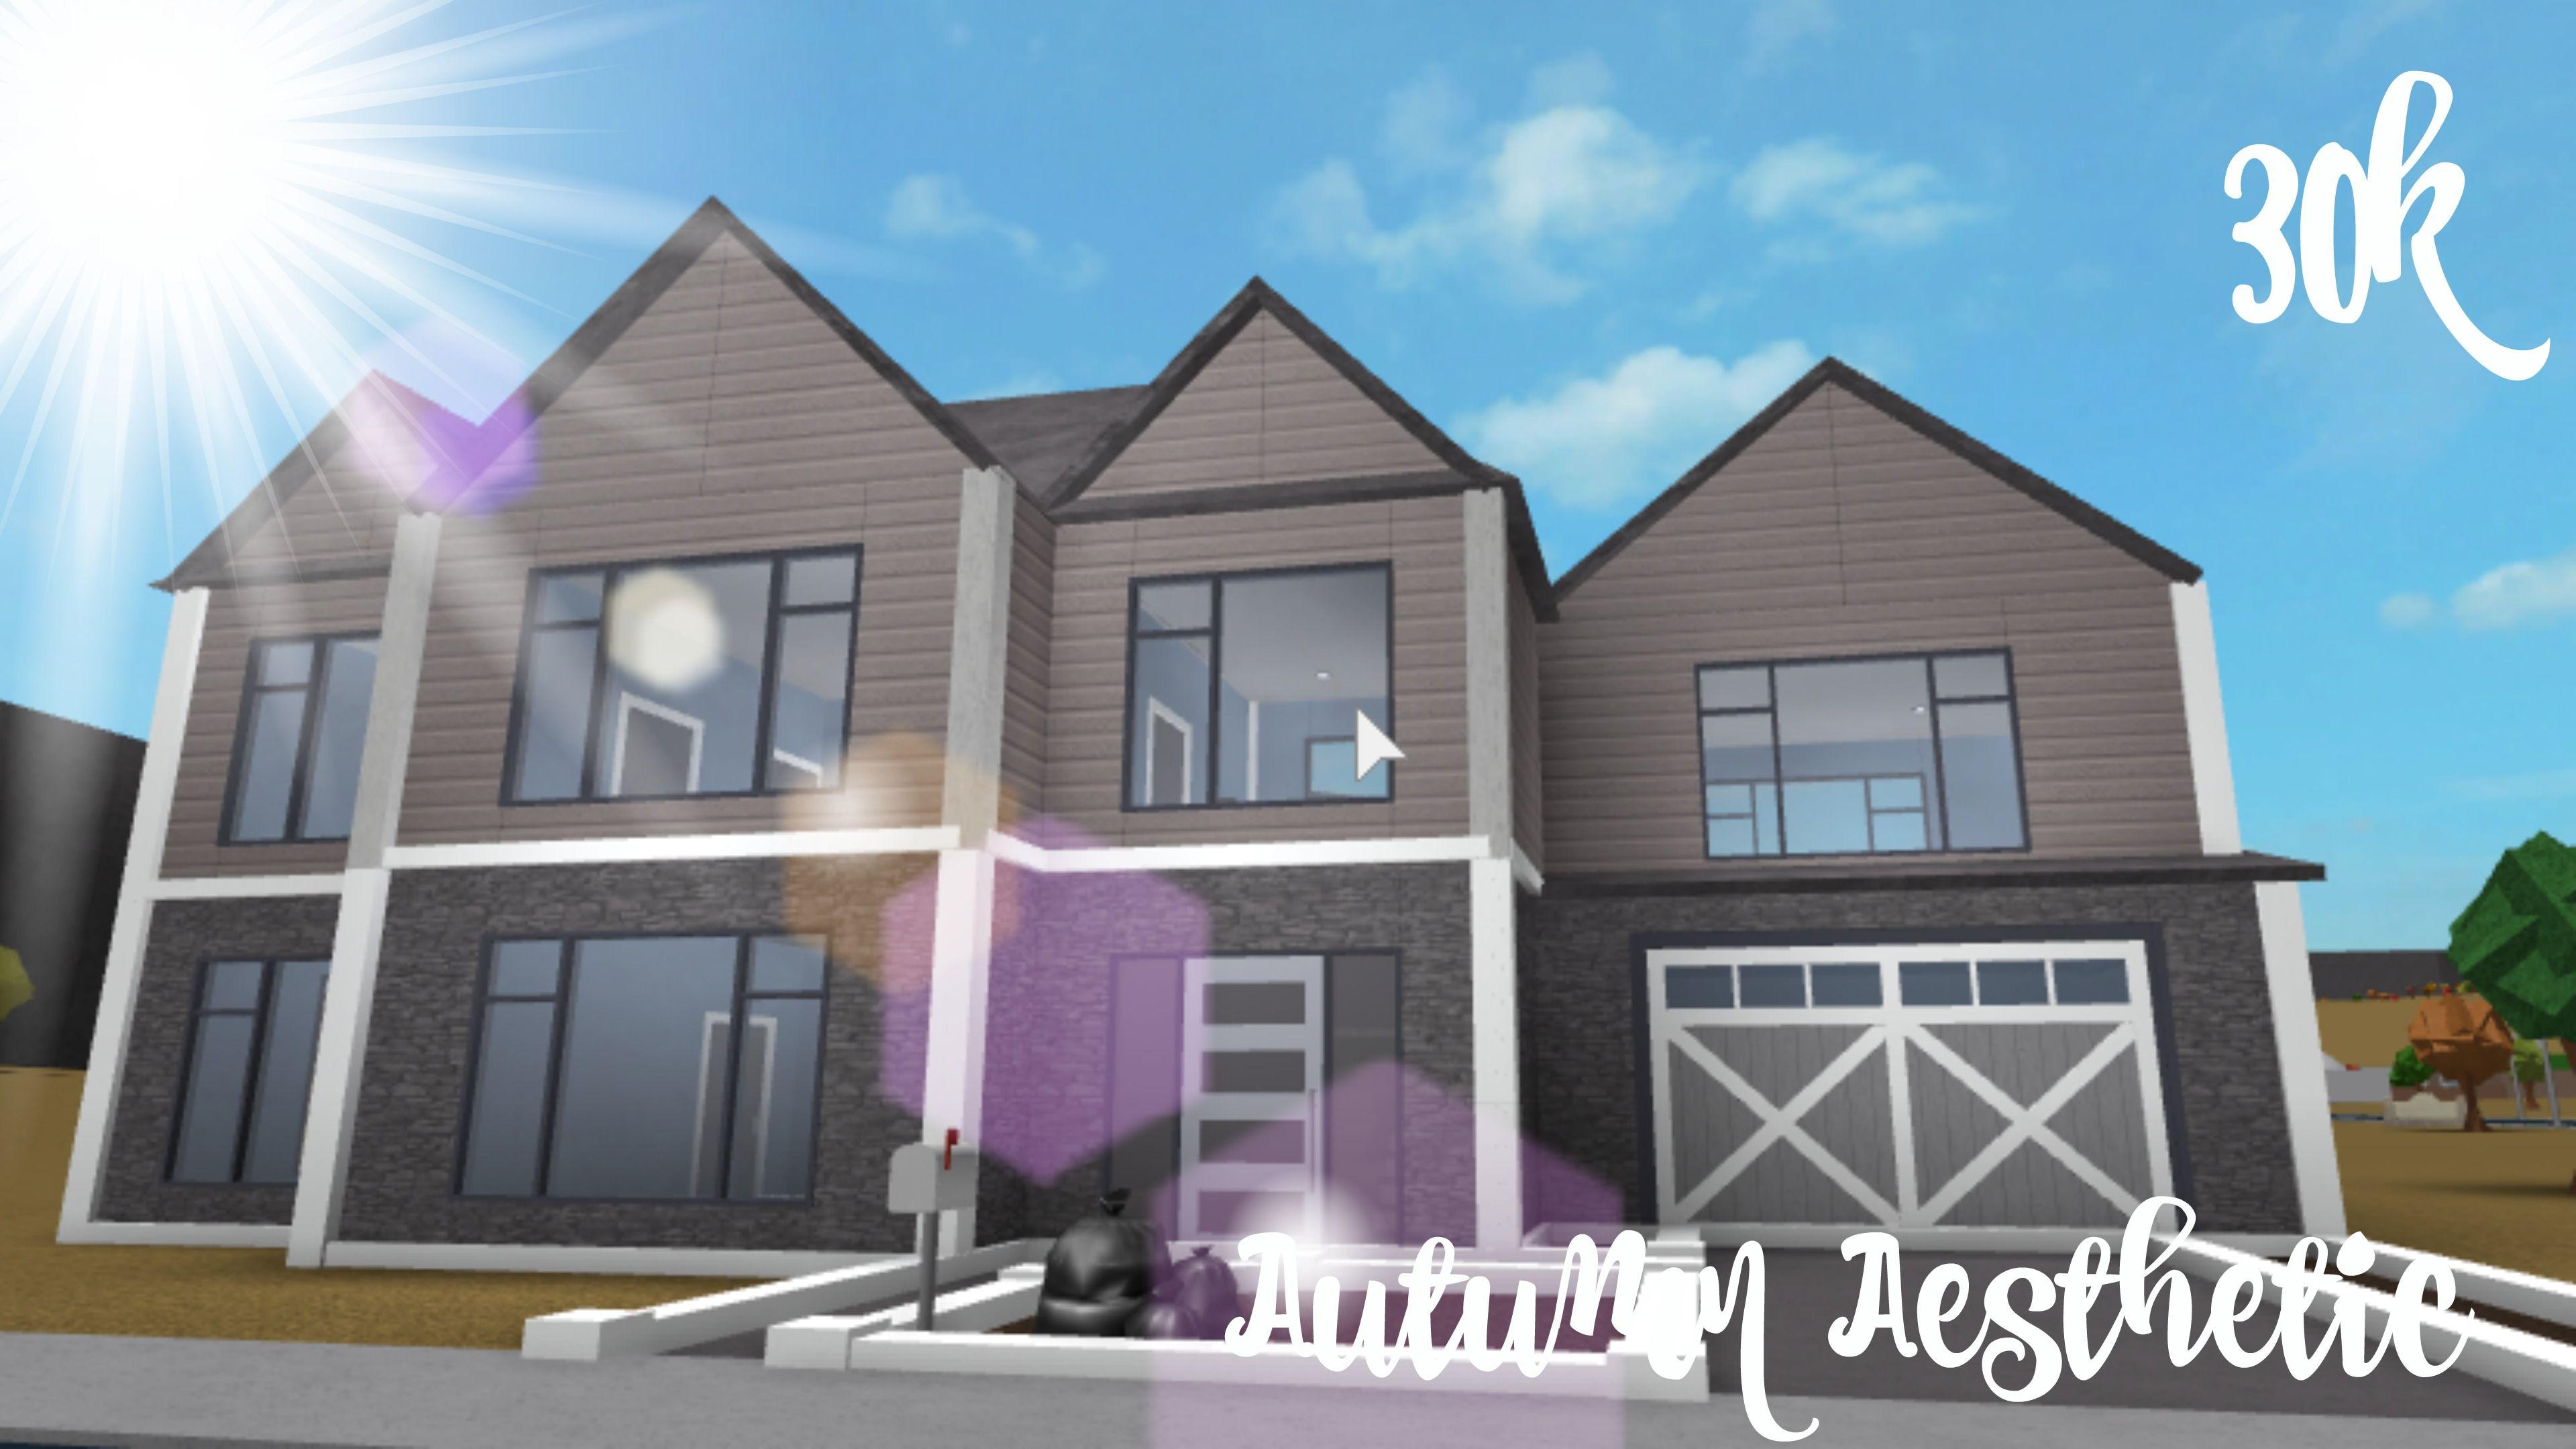 Autumn Aesthetics Modern House House Blueprints Home Building